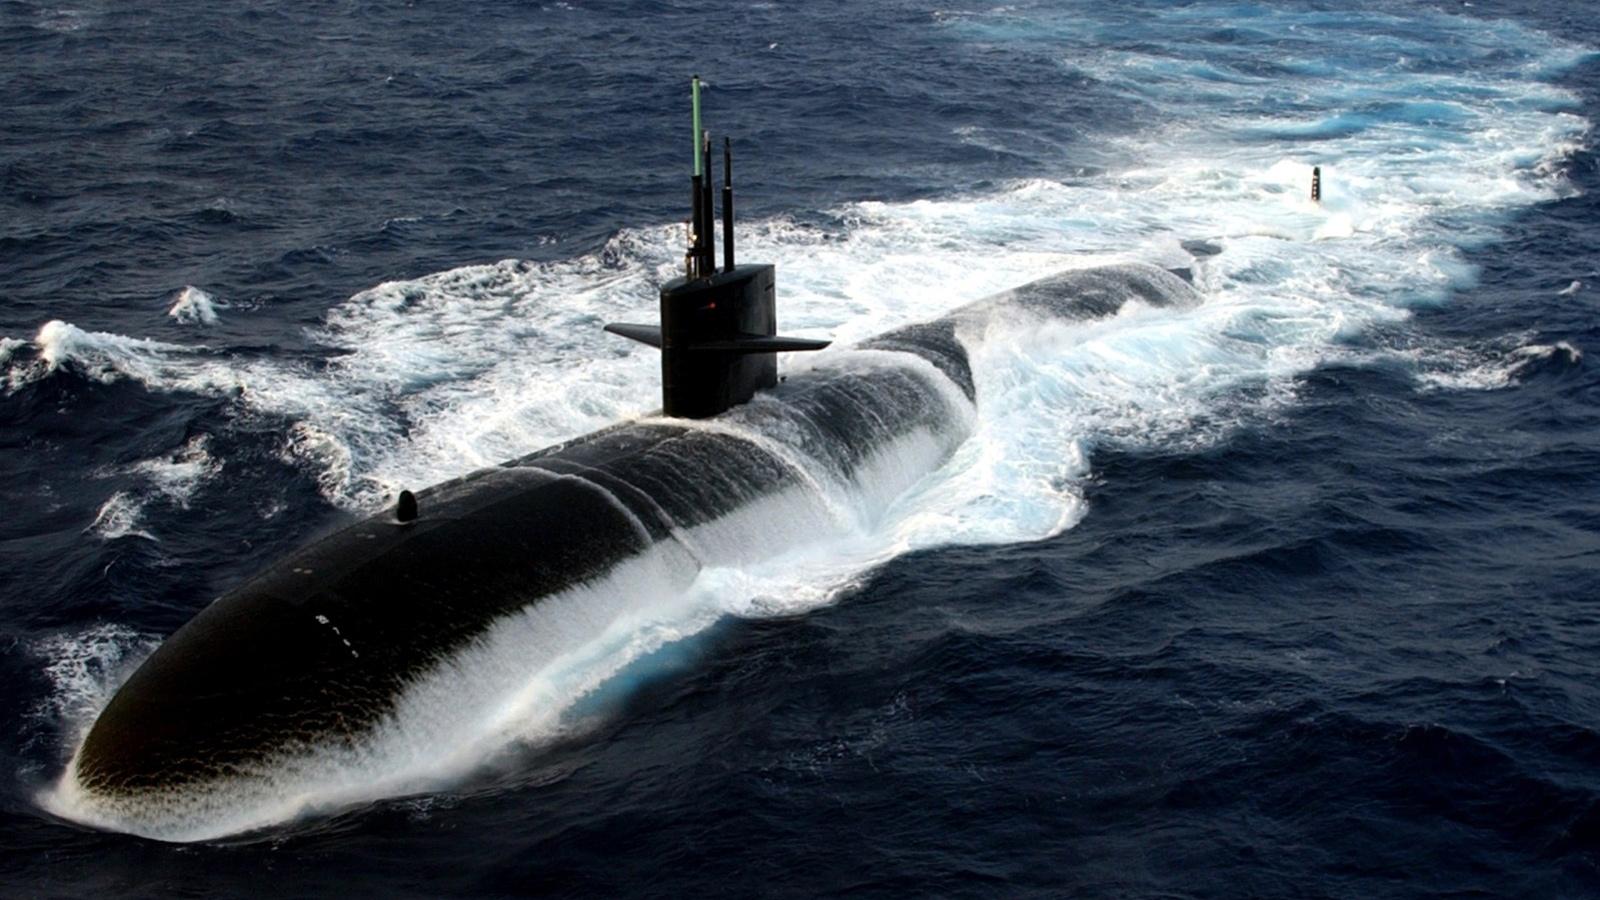 Submarine   1600x900   169 1600x900